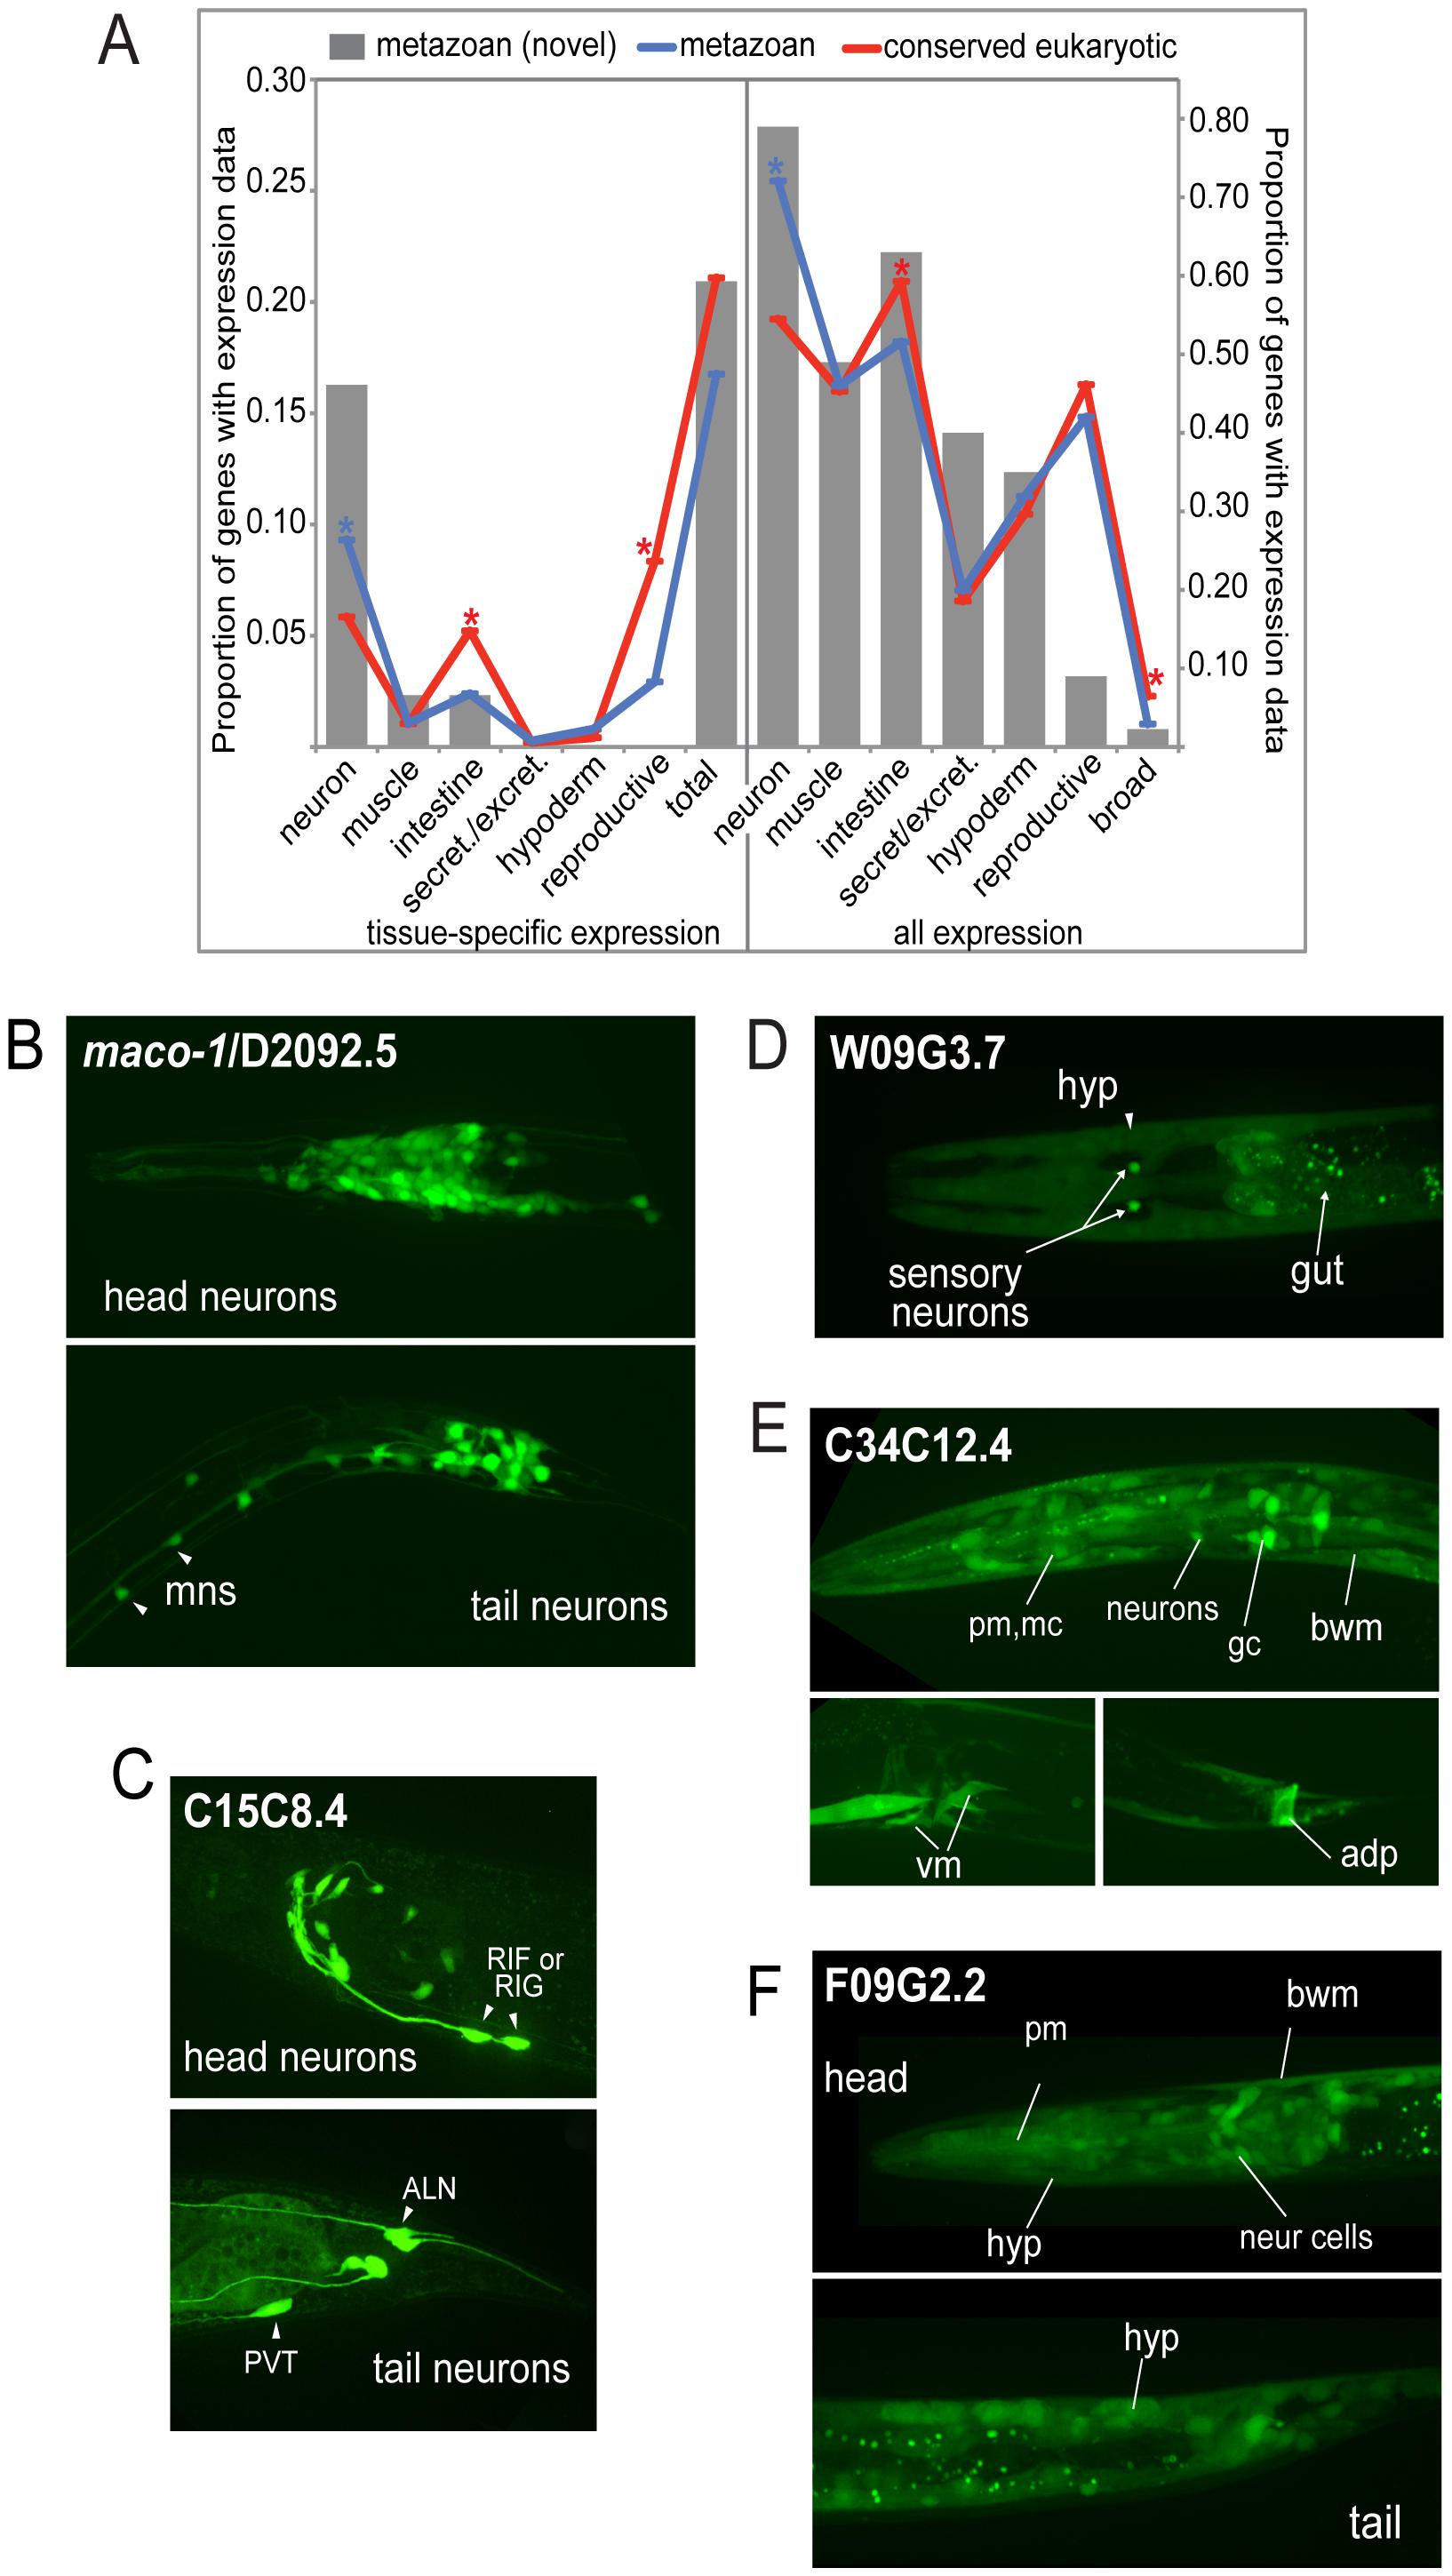 Expression patterns of metazoan-specific genes in <i>C. elegans</i>.